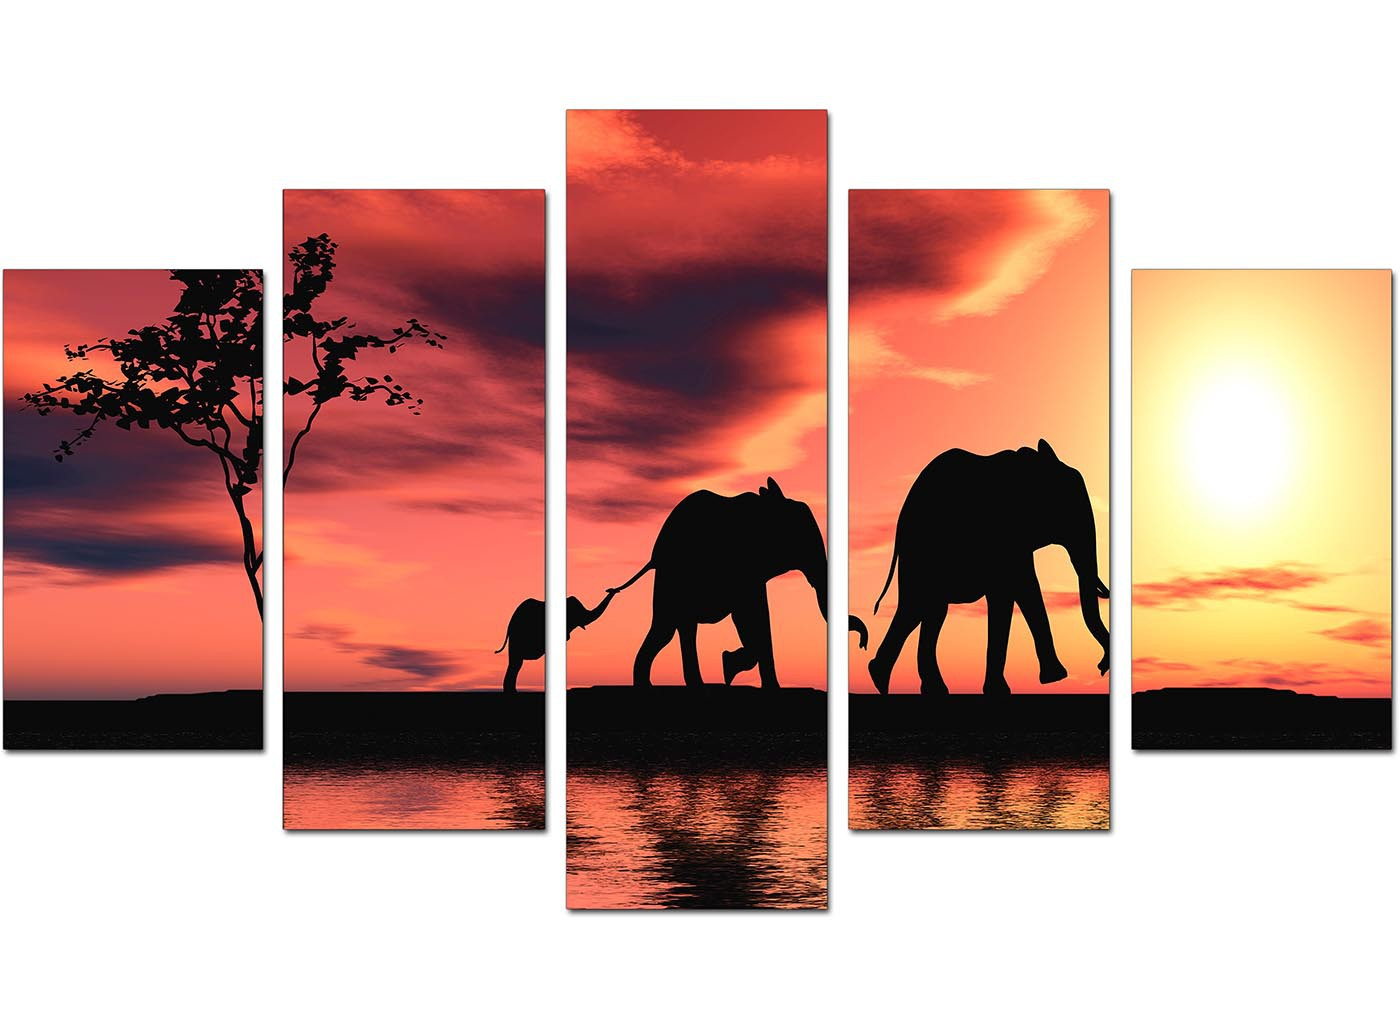 Extra Large Elephants Canvas Prints 5 Piece In Orange